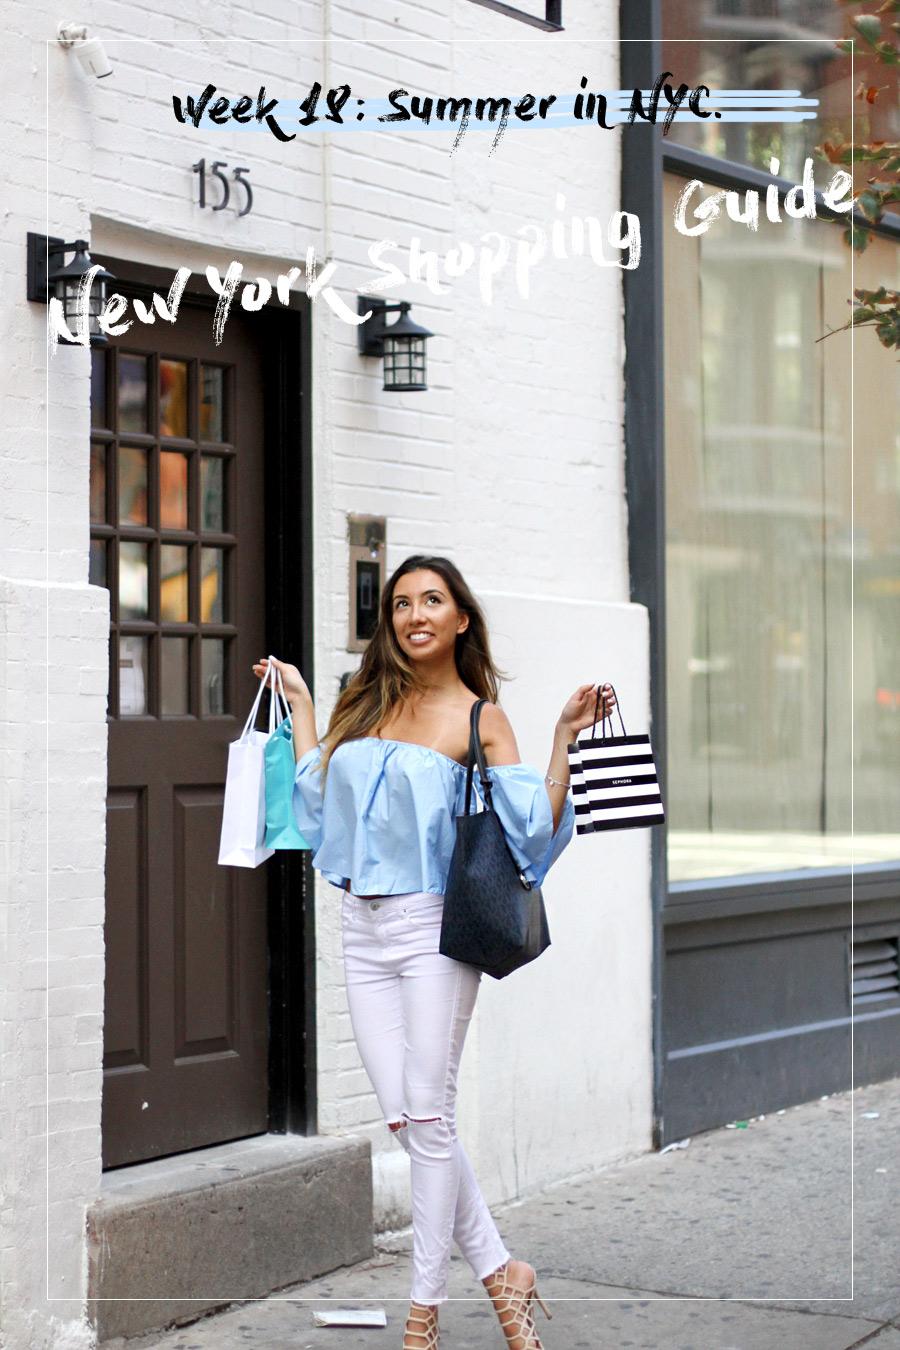 New York City Shopping Guide by blogger Ulia Ali. Шопинг гид по Нью-Йорку от блогерши.